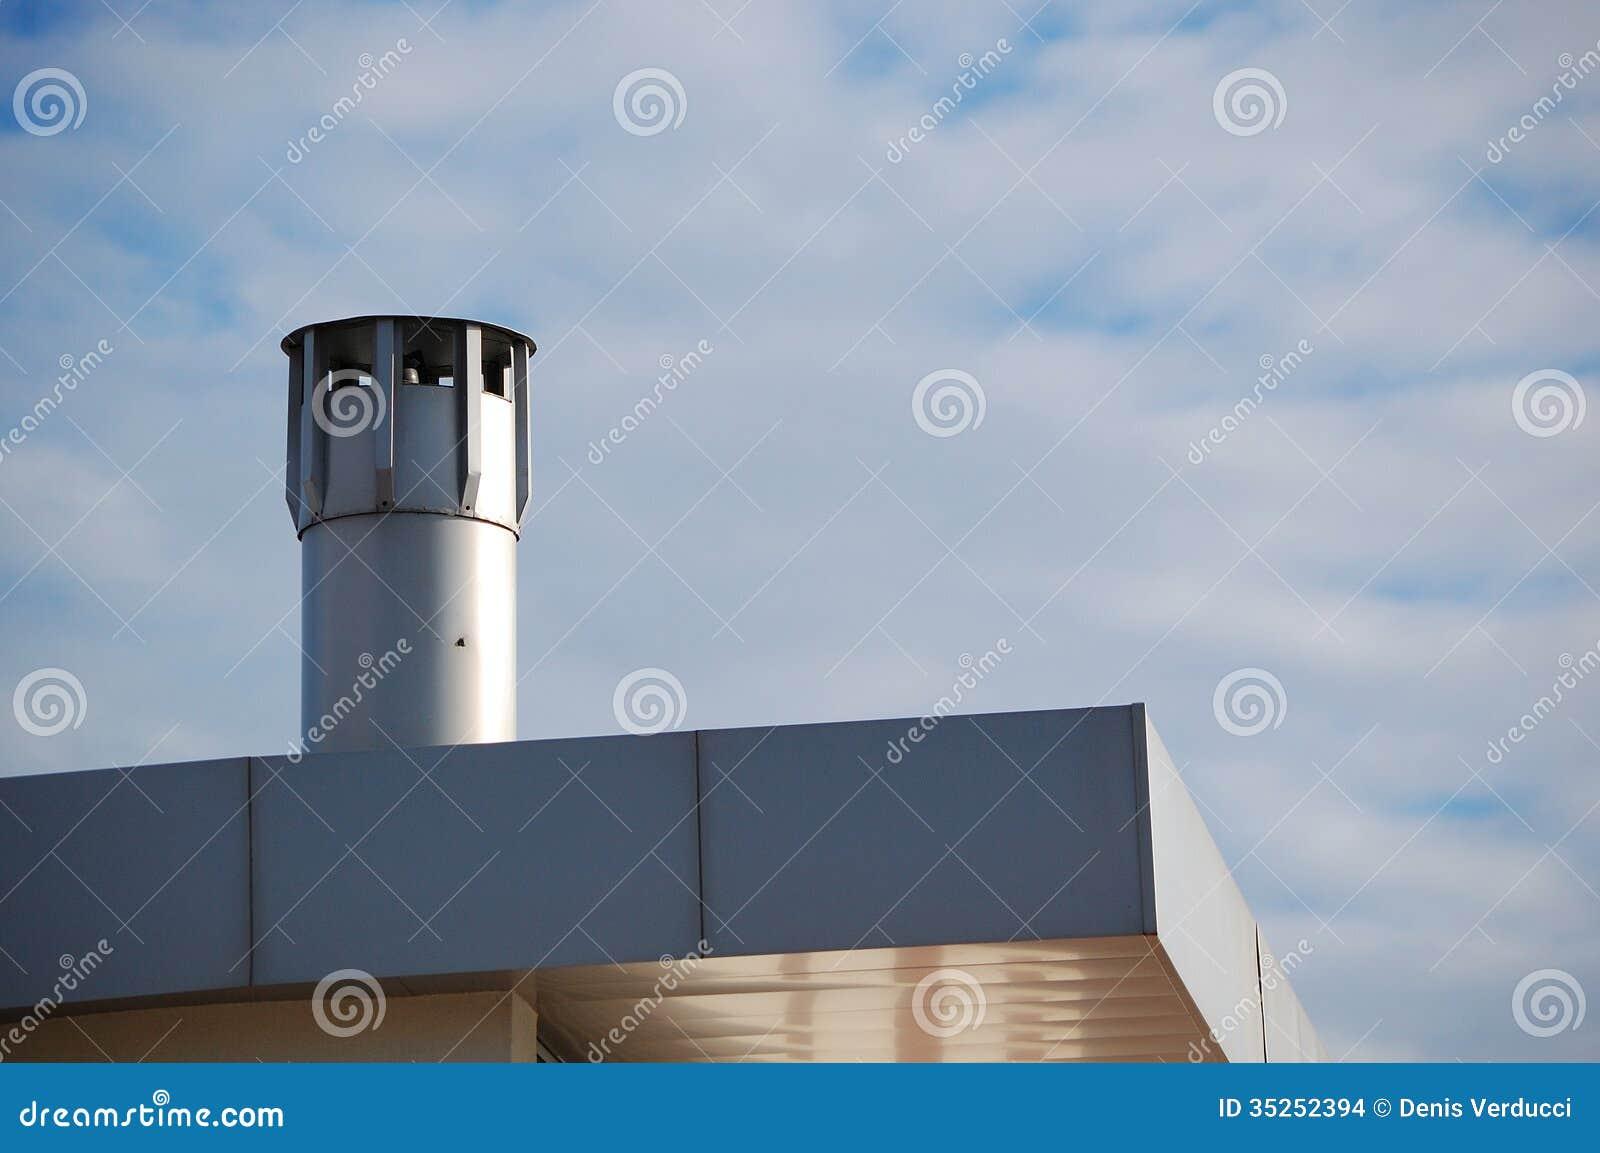 chimney basics, chimney sweep alexandria chimney cleaning arlington ...